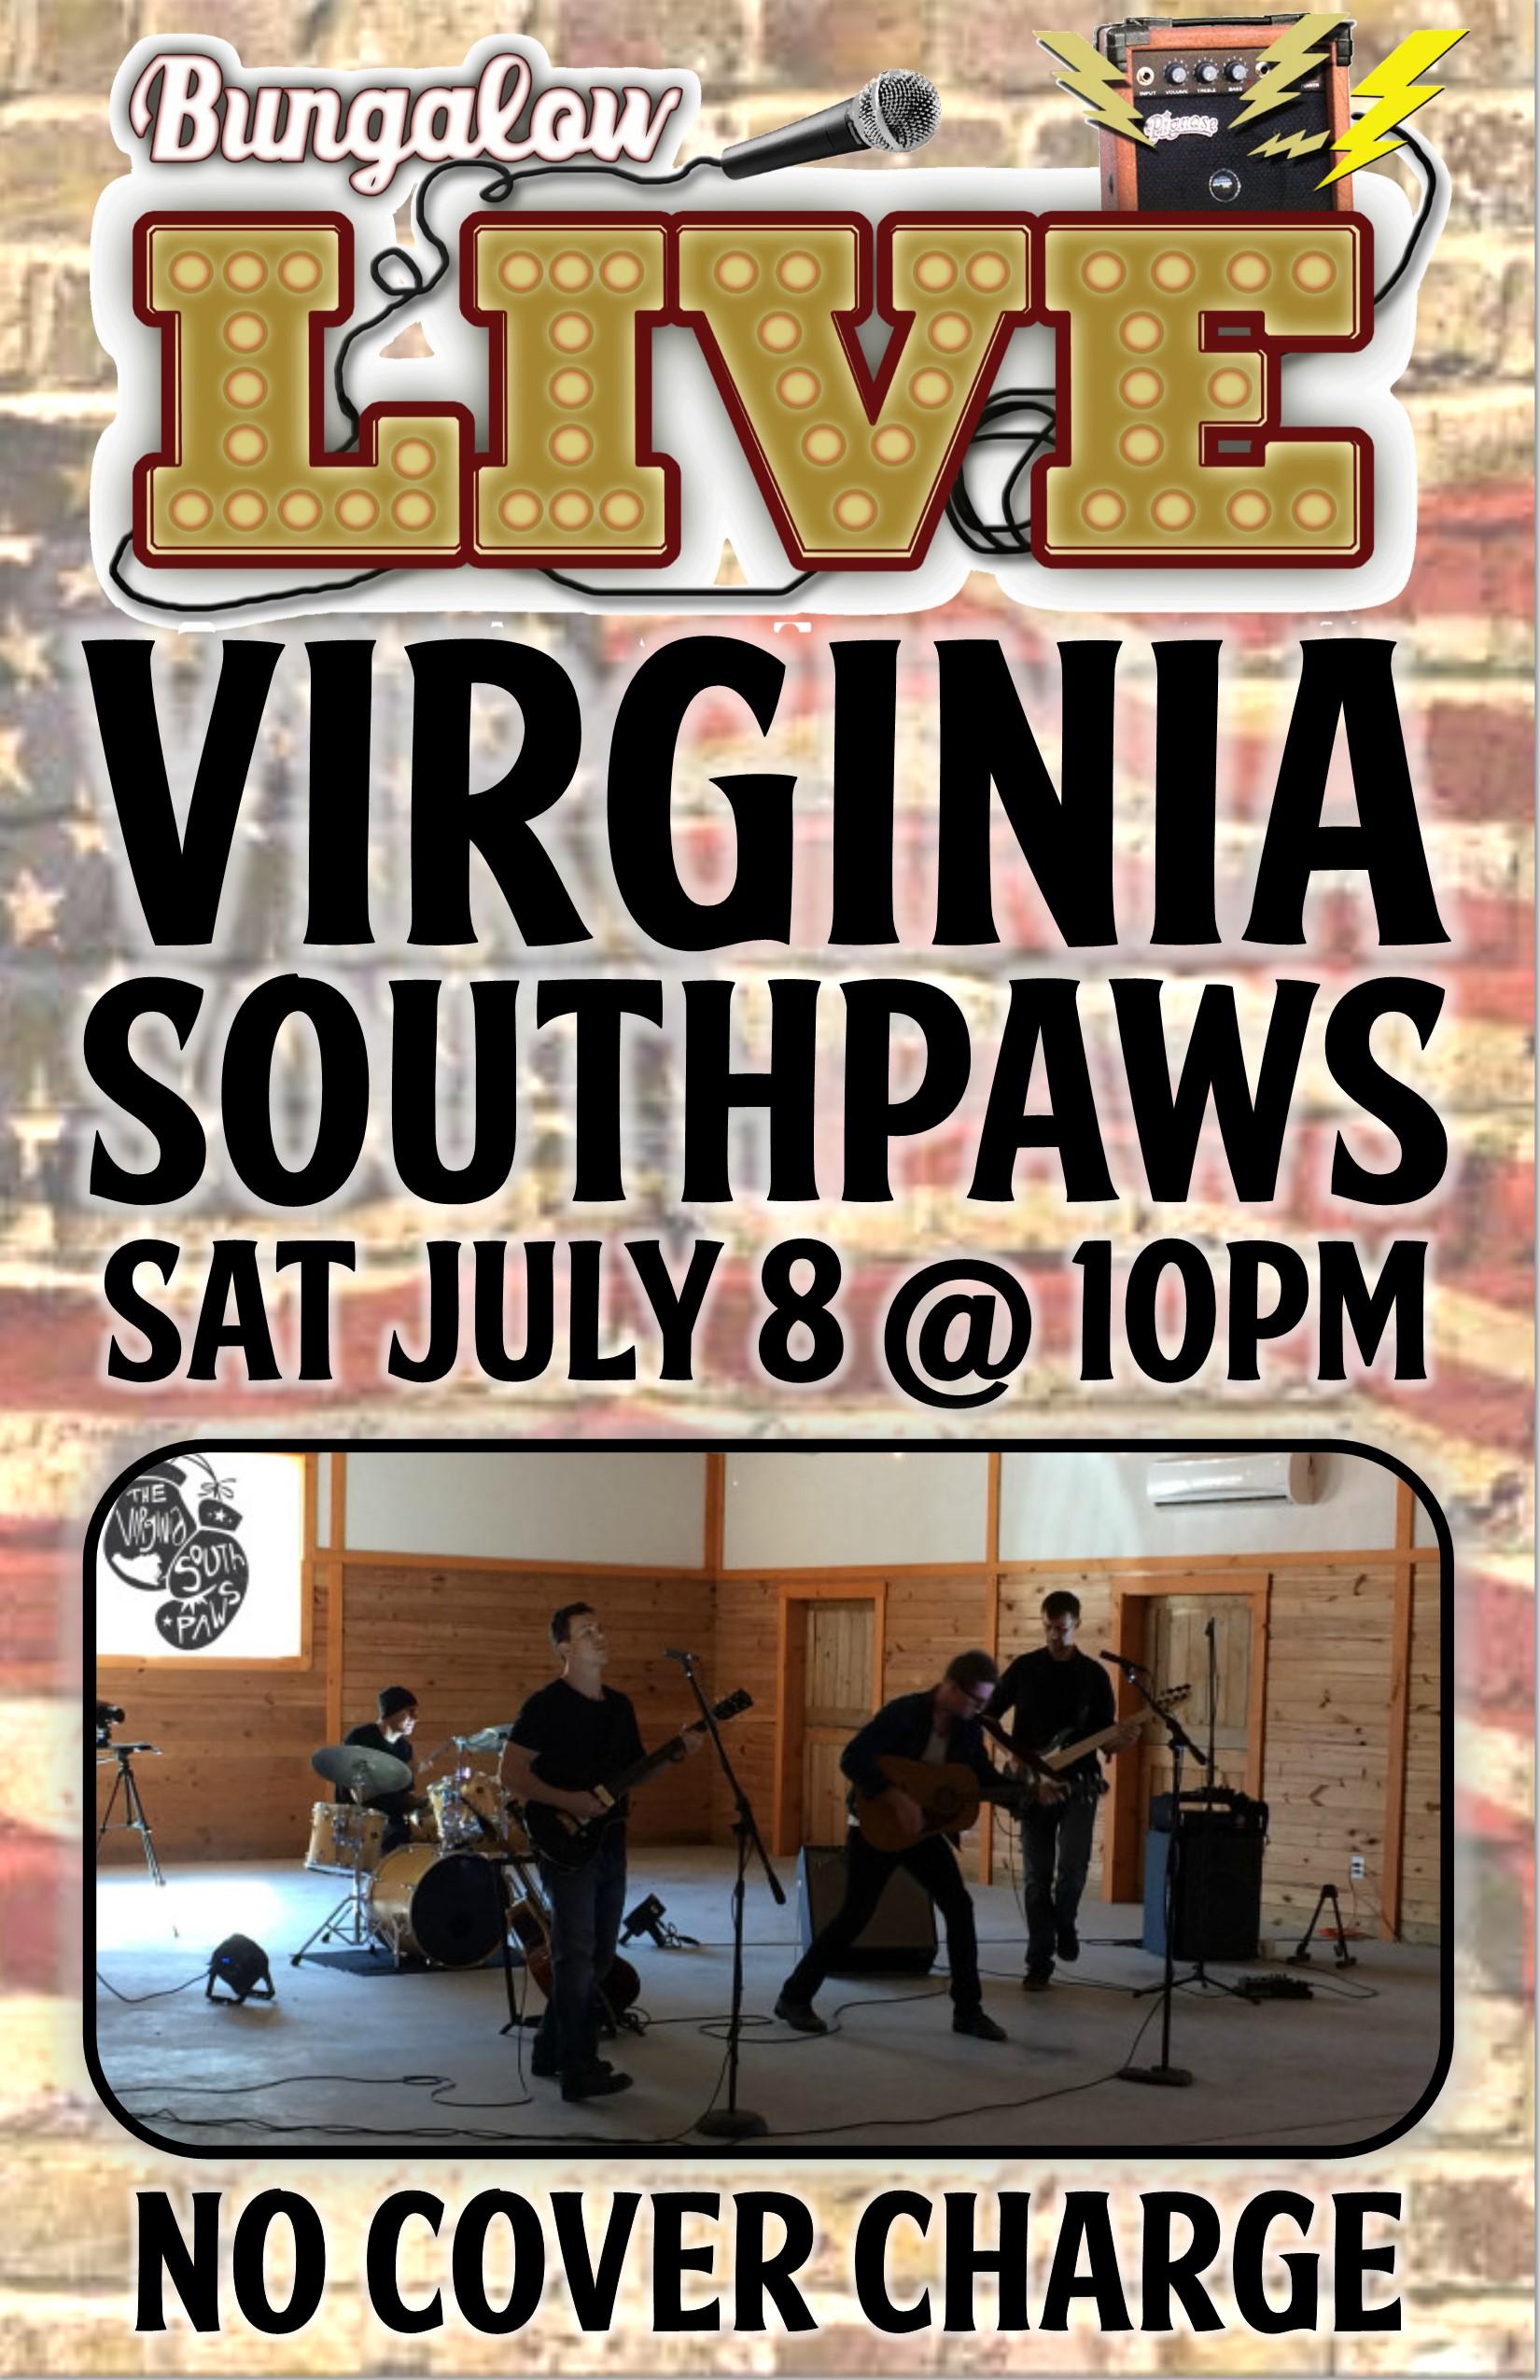 VA Southpaws